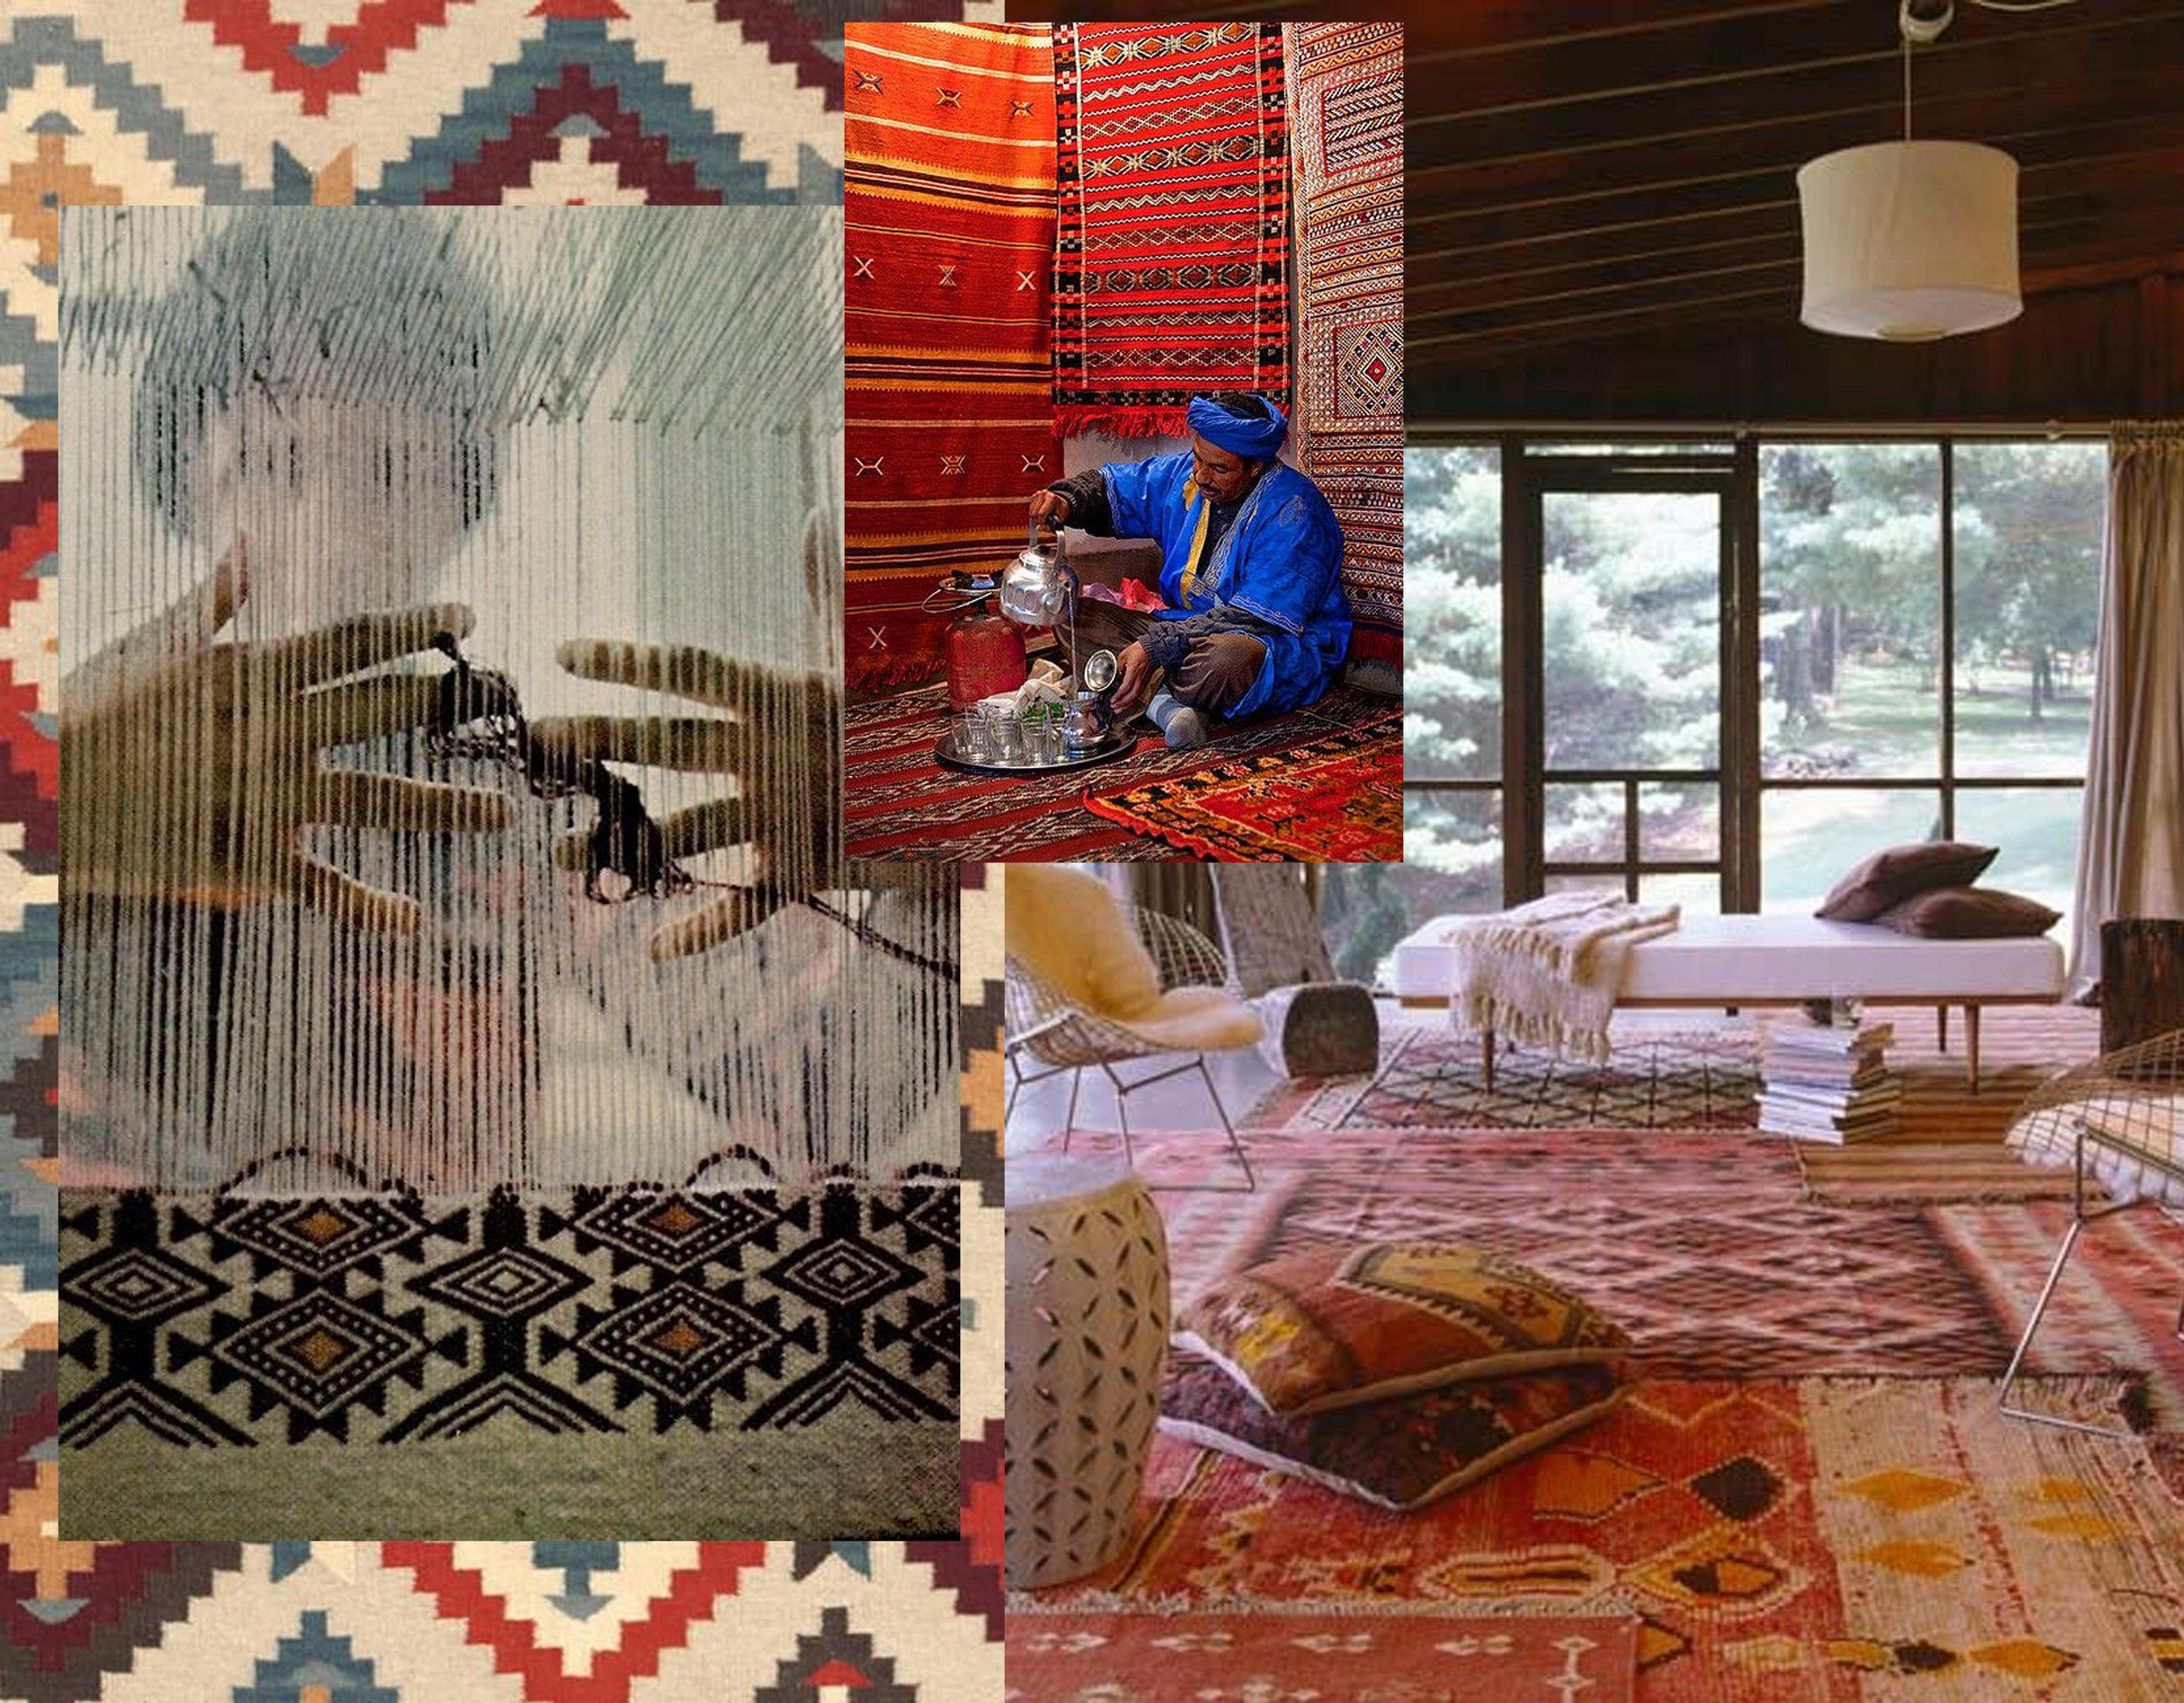 Kilim  Annie Selke  - kilim weaving via  National Geographics - kilim shop via  Yes and Yes - interior image via  The White Buffalo Styling